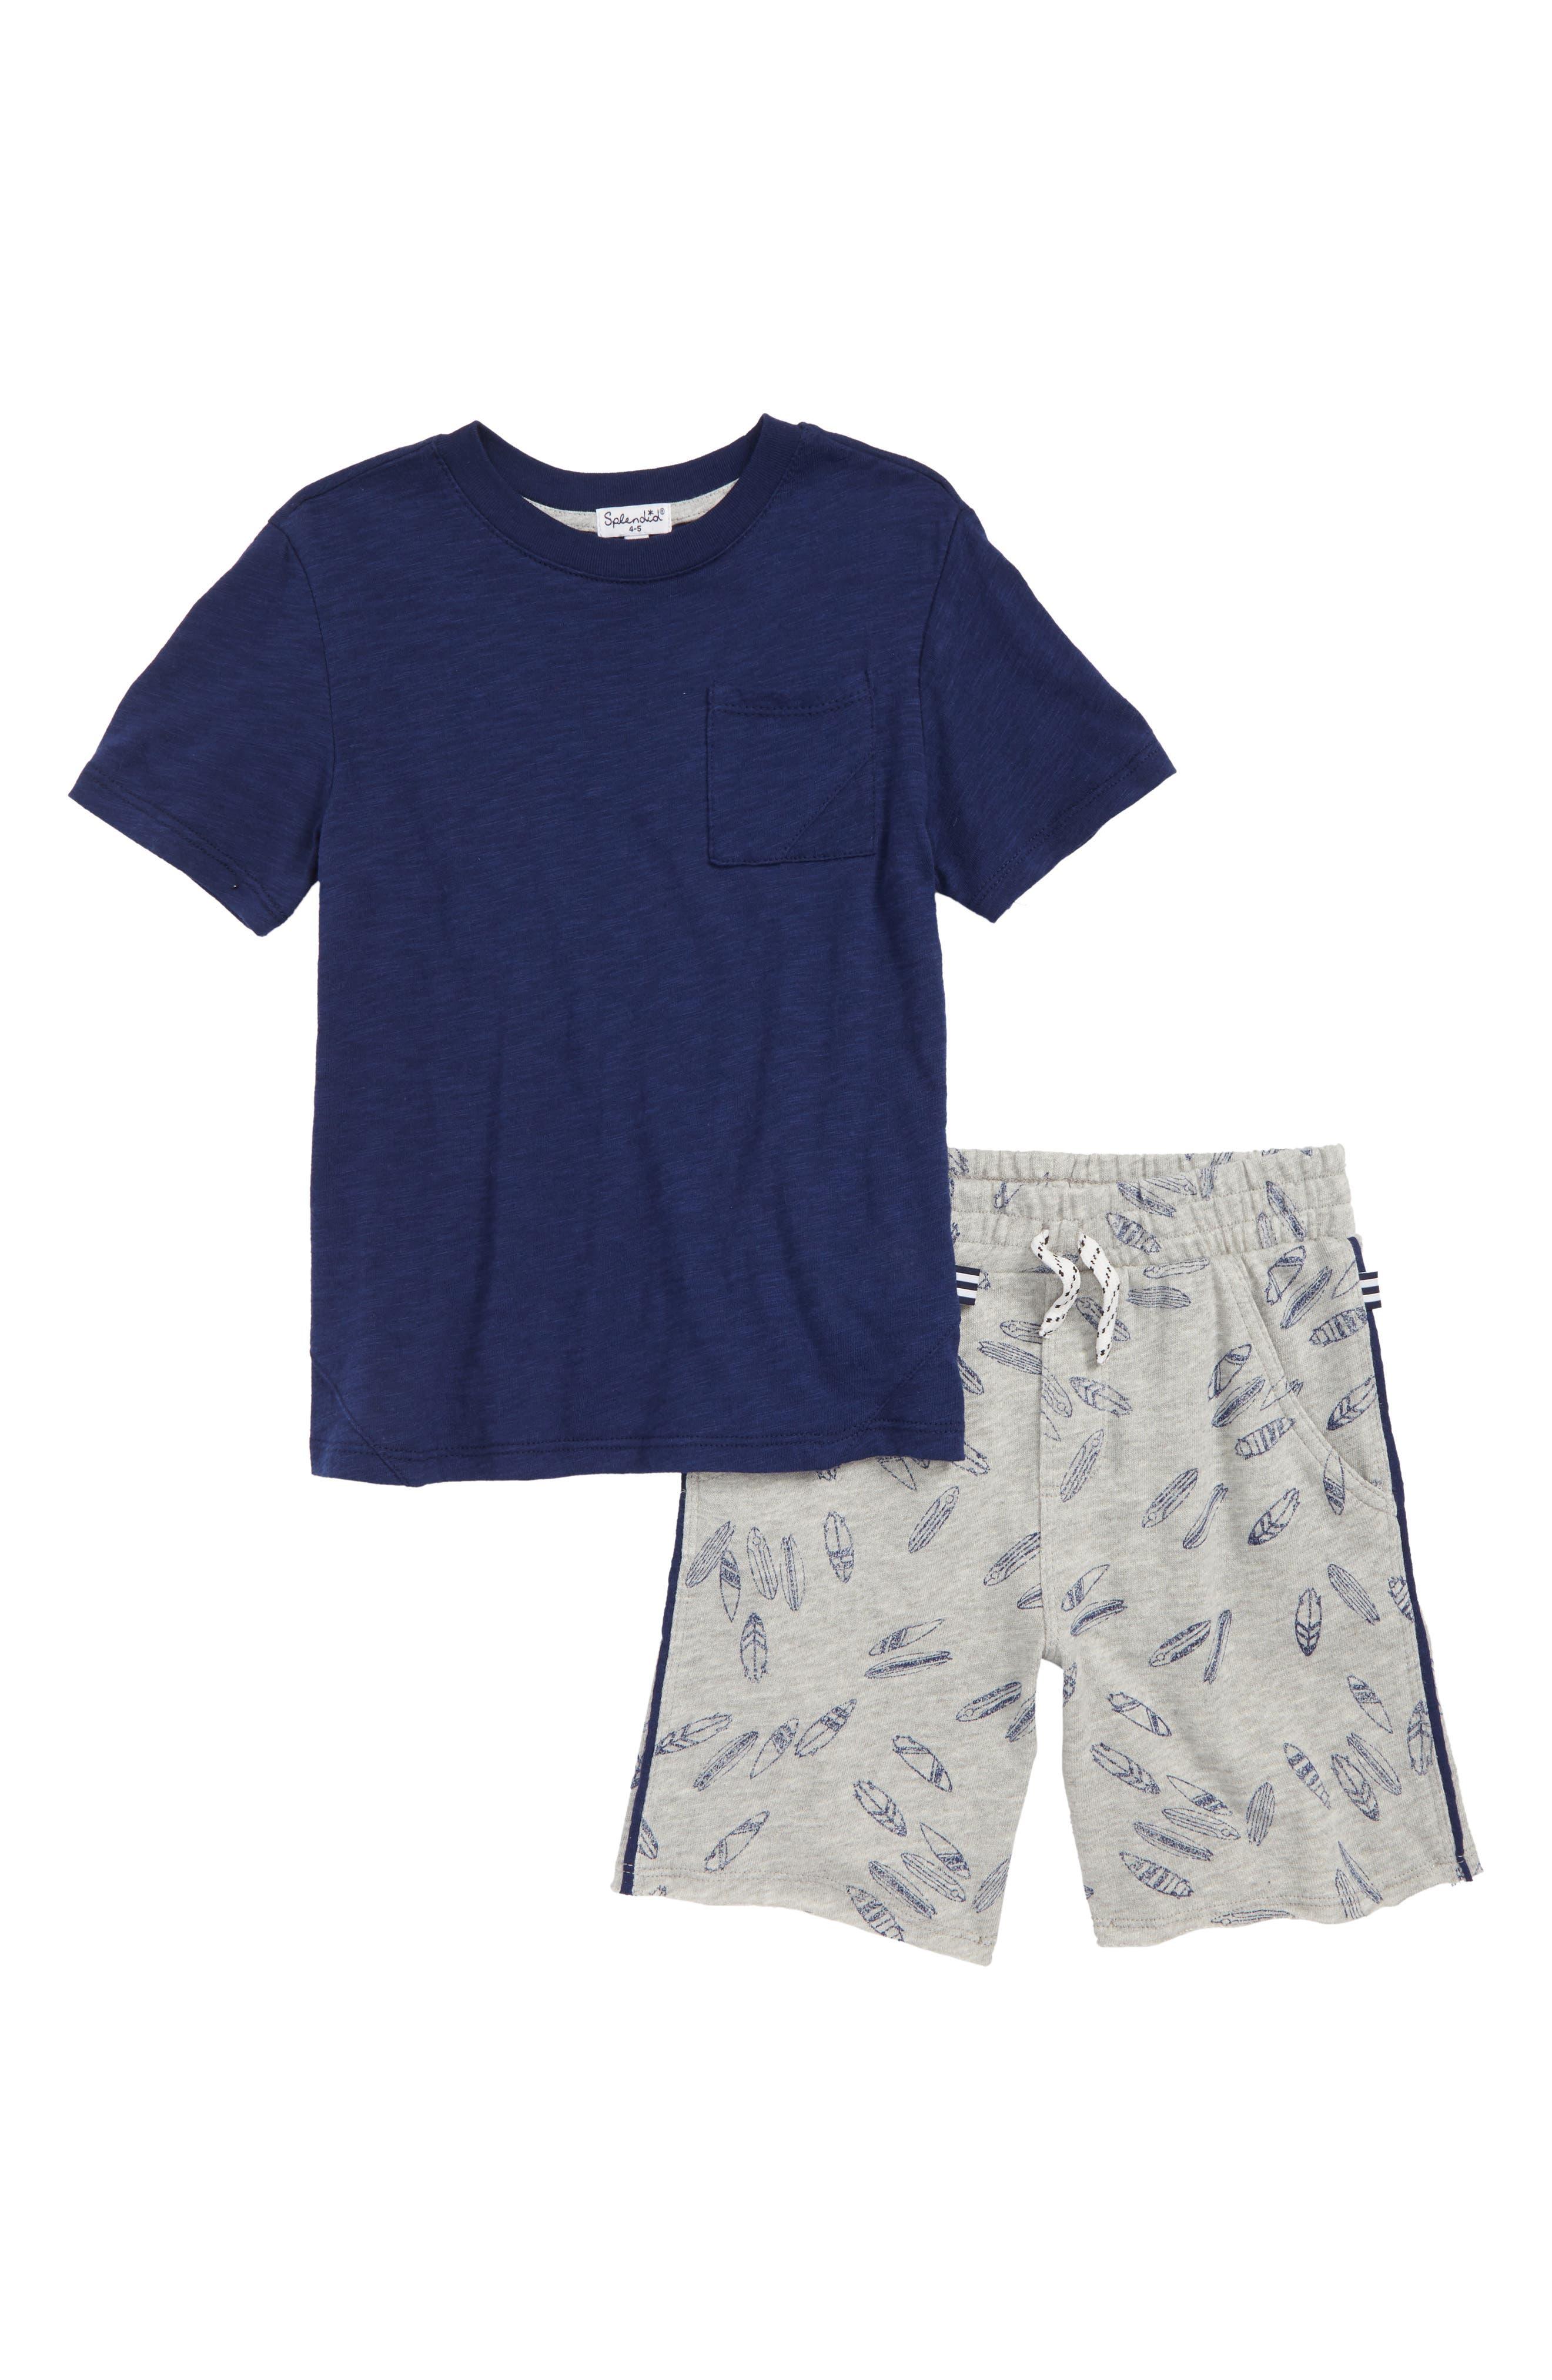 T-Shirt & Surfboard Graphic Shorts Set,                         Main,                         color, Indigo Sky